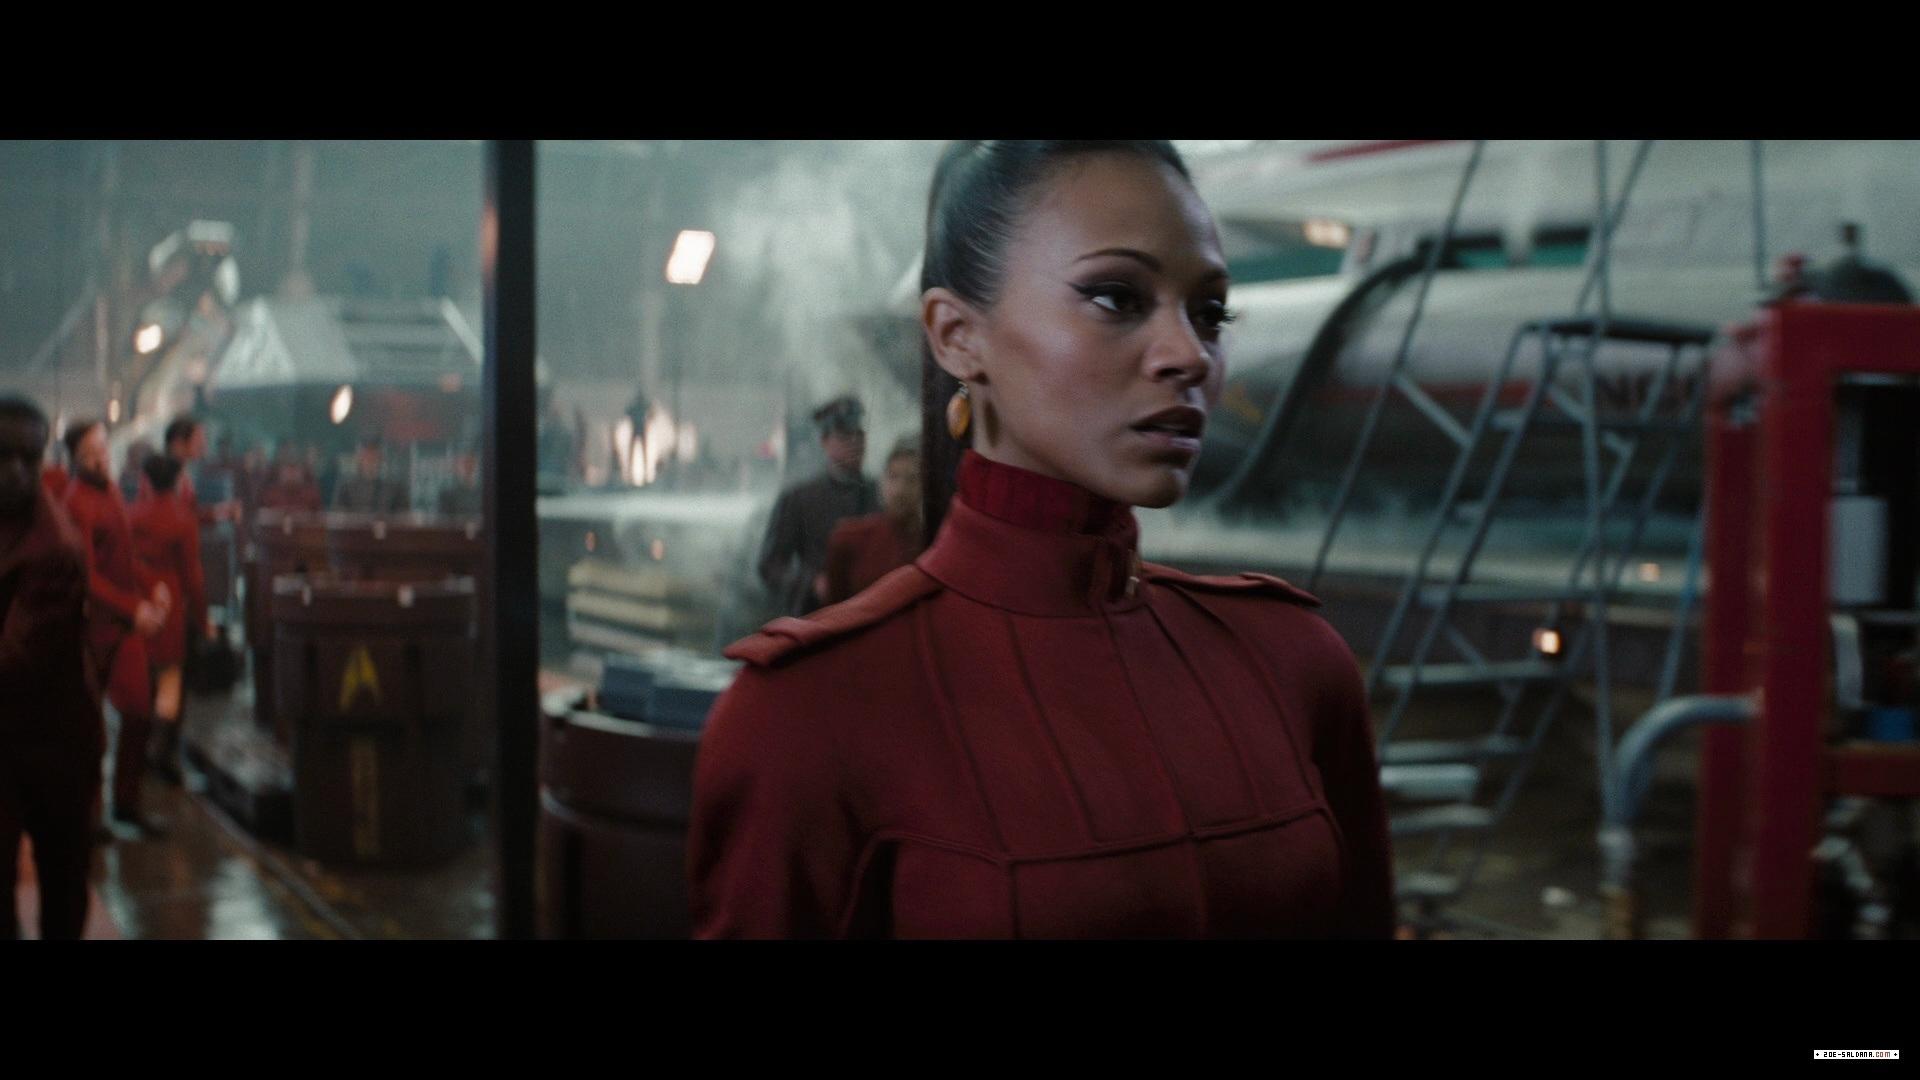 Zoe-Saldana-Star-Trek-screencaps-zoe-saldana-9860131-1920-1080 jpgZoe Saldana Star Trek